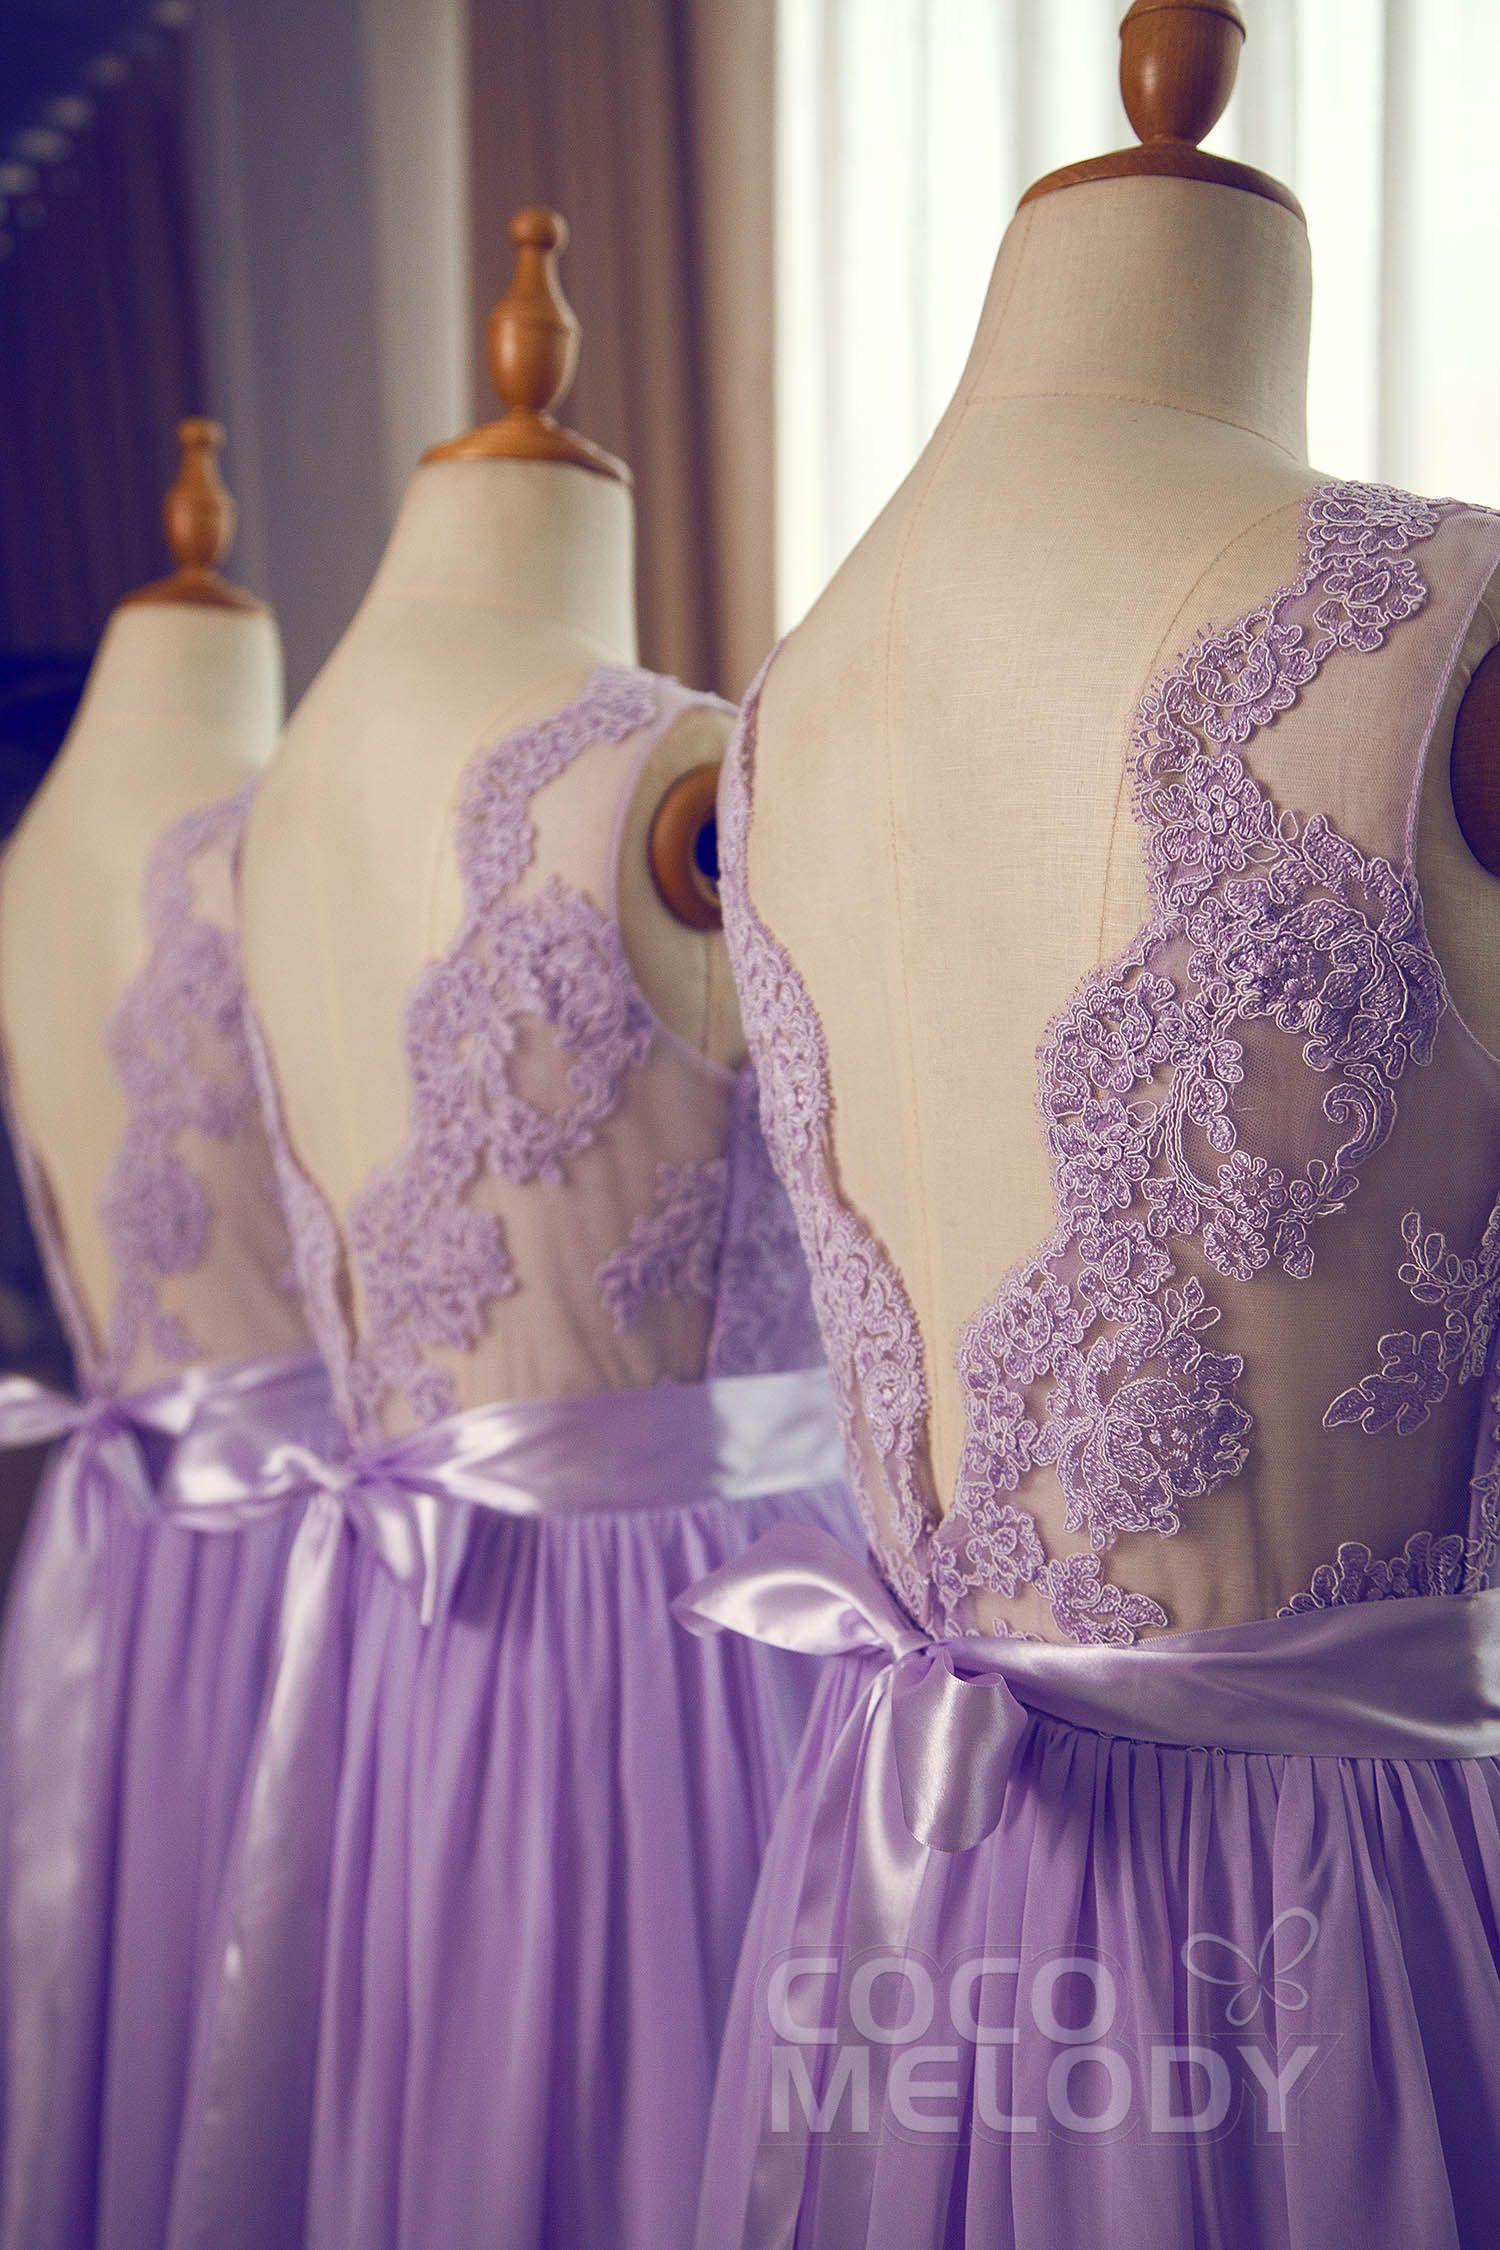 Lace wedding dress open back say yes dress  SheathColumn VNeck Natural SweepBrush Train Chiffon Sleeveless